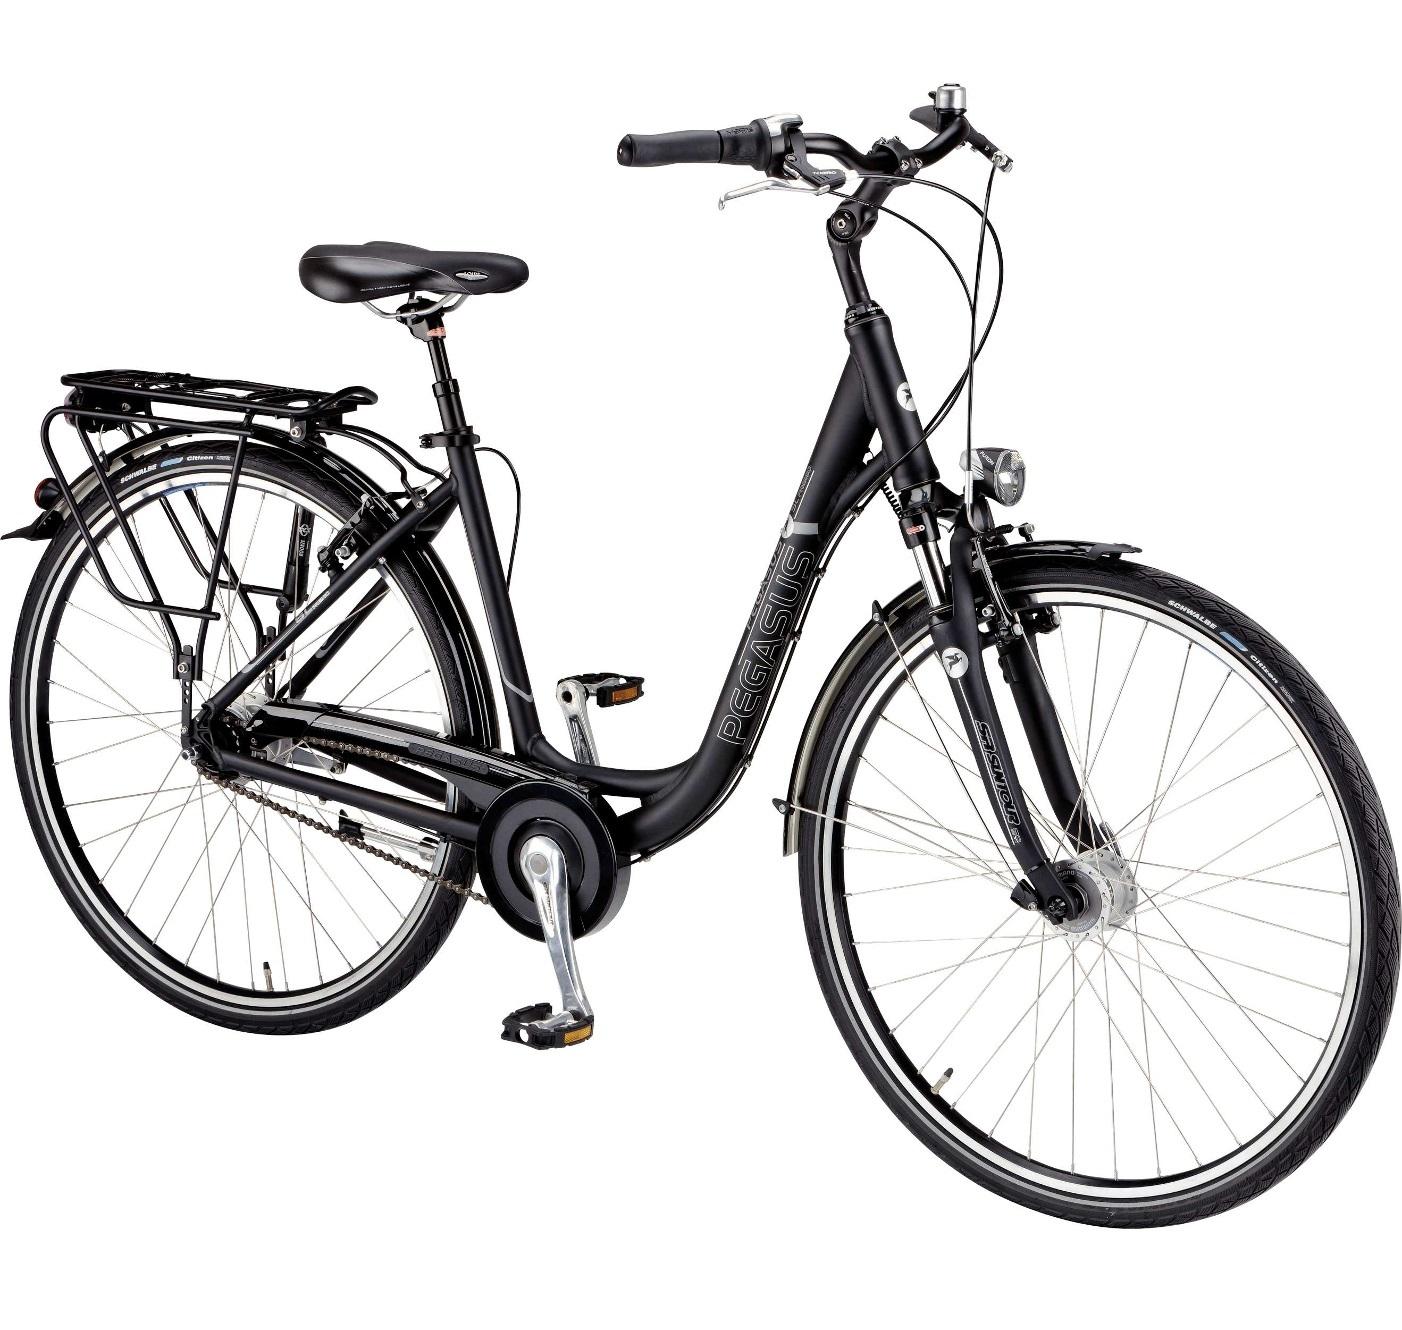 damen trekking fahrrad pegasus premio sl schwarz 45 cm. Black Bedroom Furniture Sets. Home Design Ideas